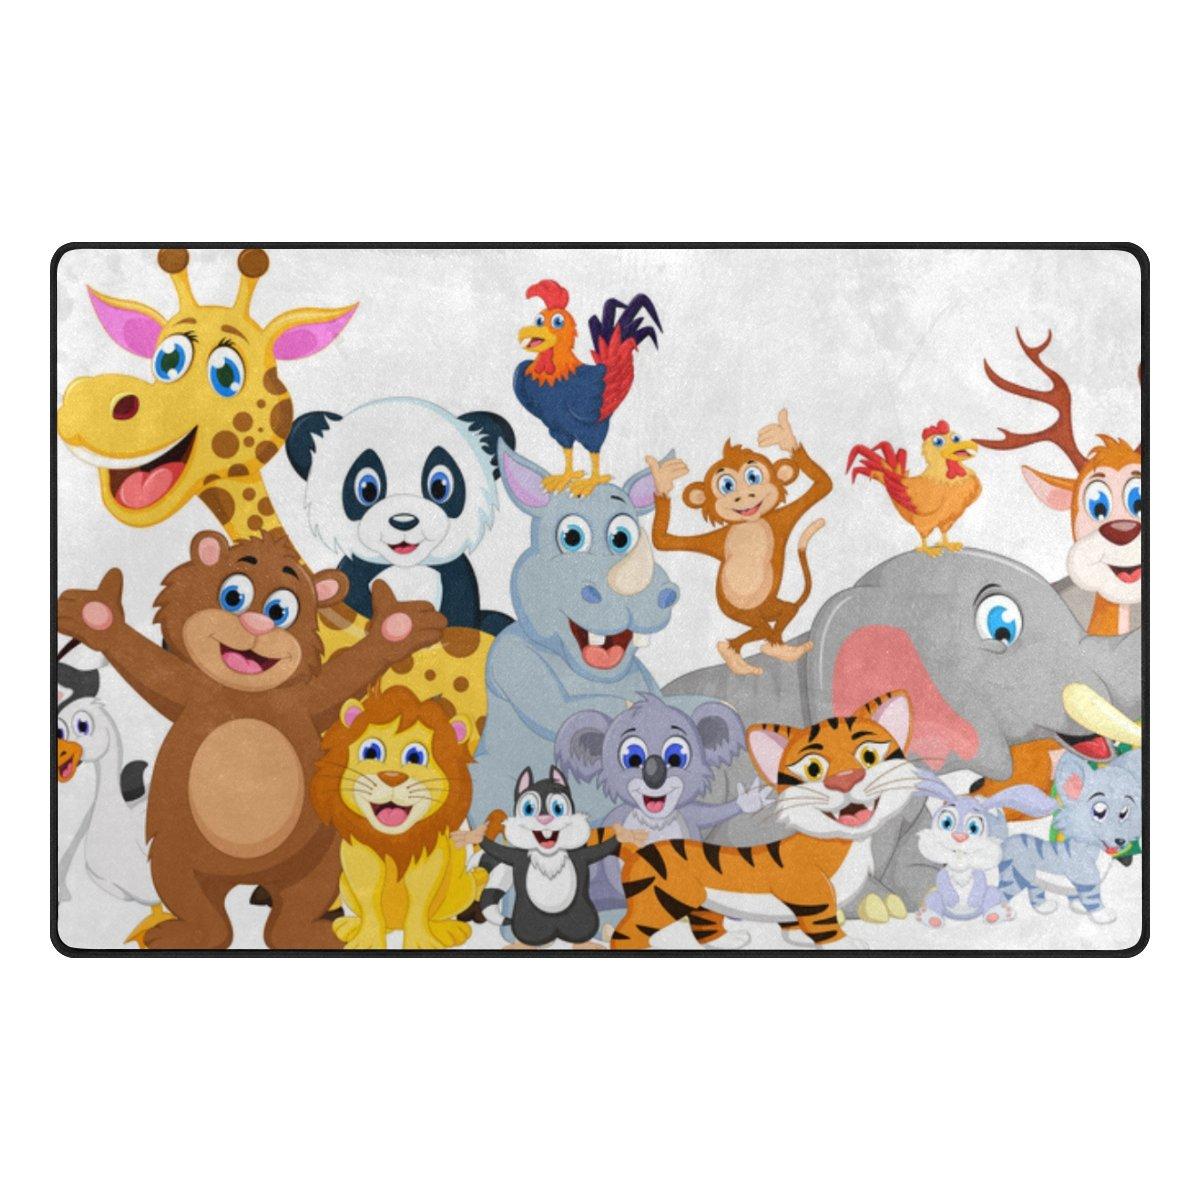 U LIFE Cute Kids Tropical Animal Forest Jungle World Map Large Doormats Area Rug Runner Floor Mat Carpet for Entrance Way Living Room Bedroom Kitchen Office 63 x 48 Inch